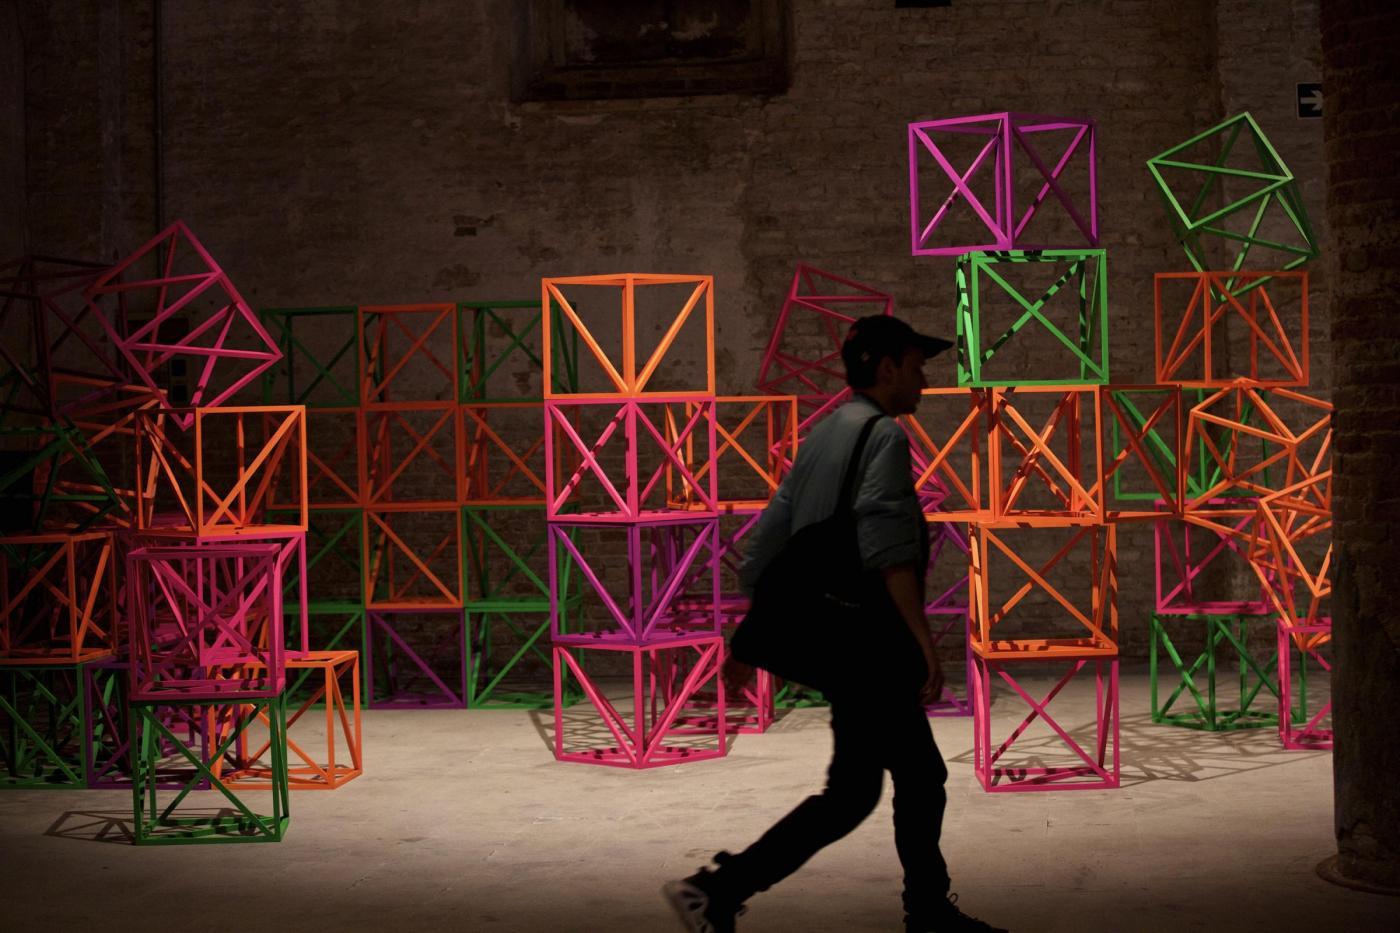 Italia, Biennale di Venezia